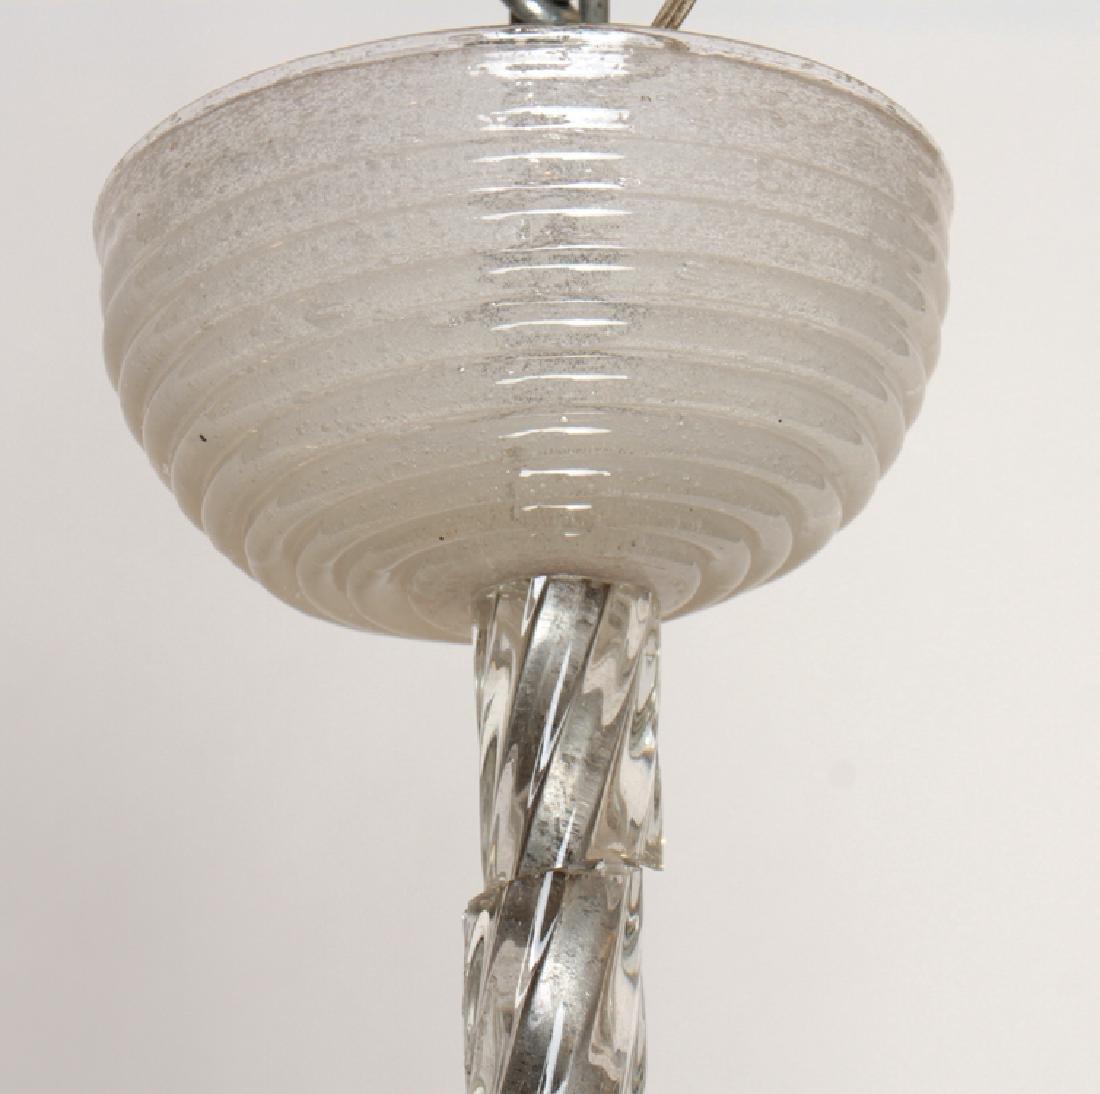 MURANO GLASS CHANDELIER CIRCA 1950 - 2